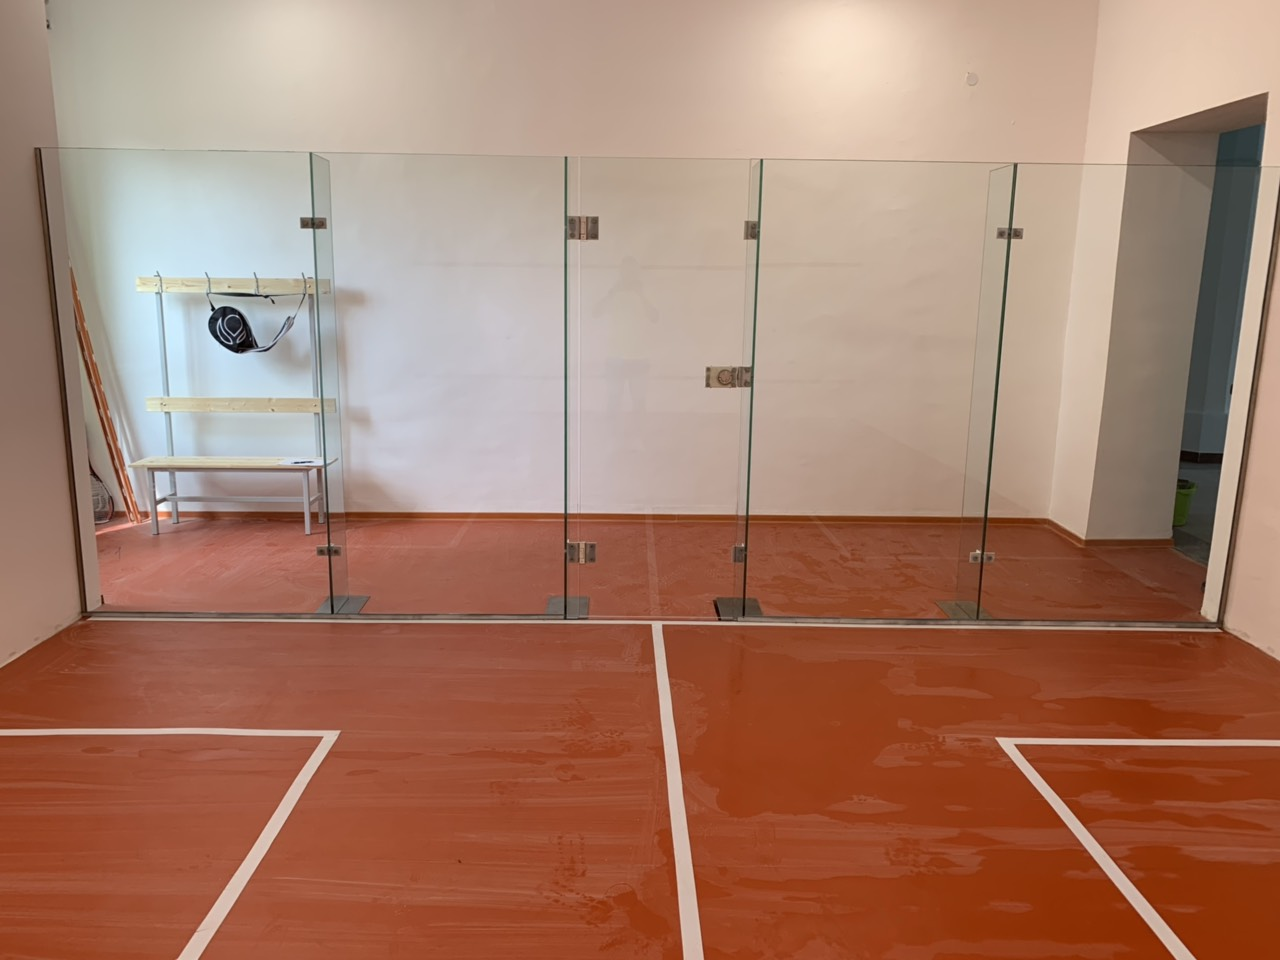 Üveg squash pálya